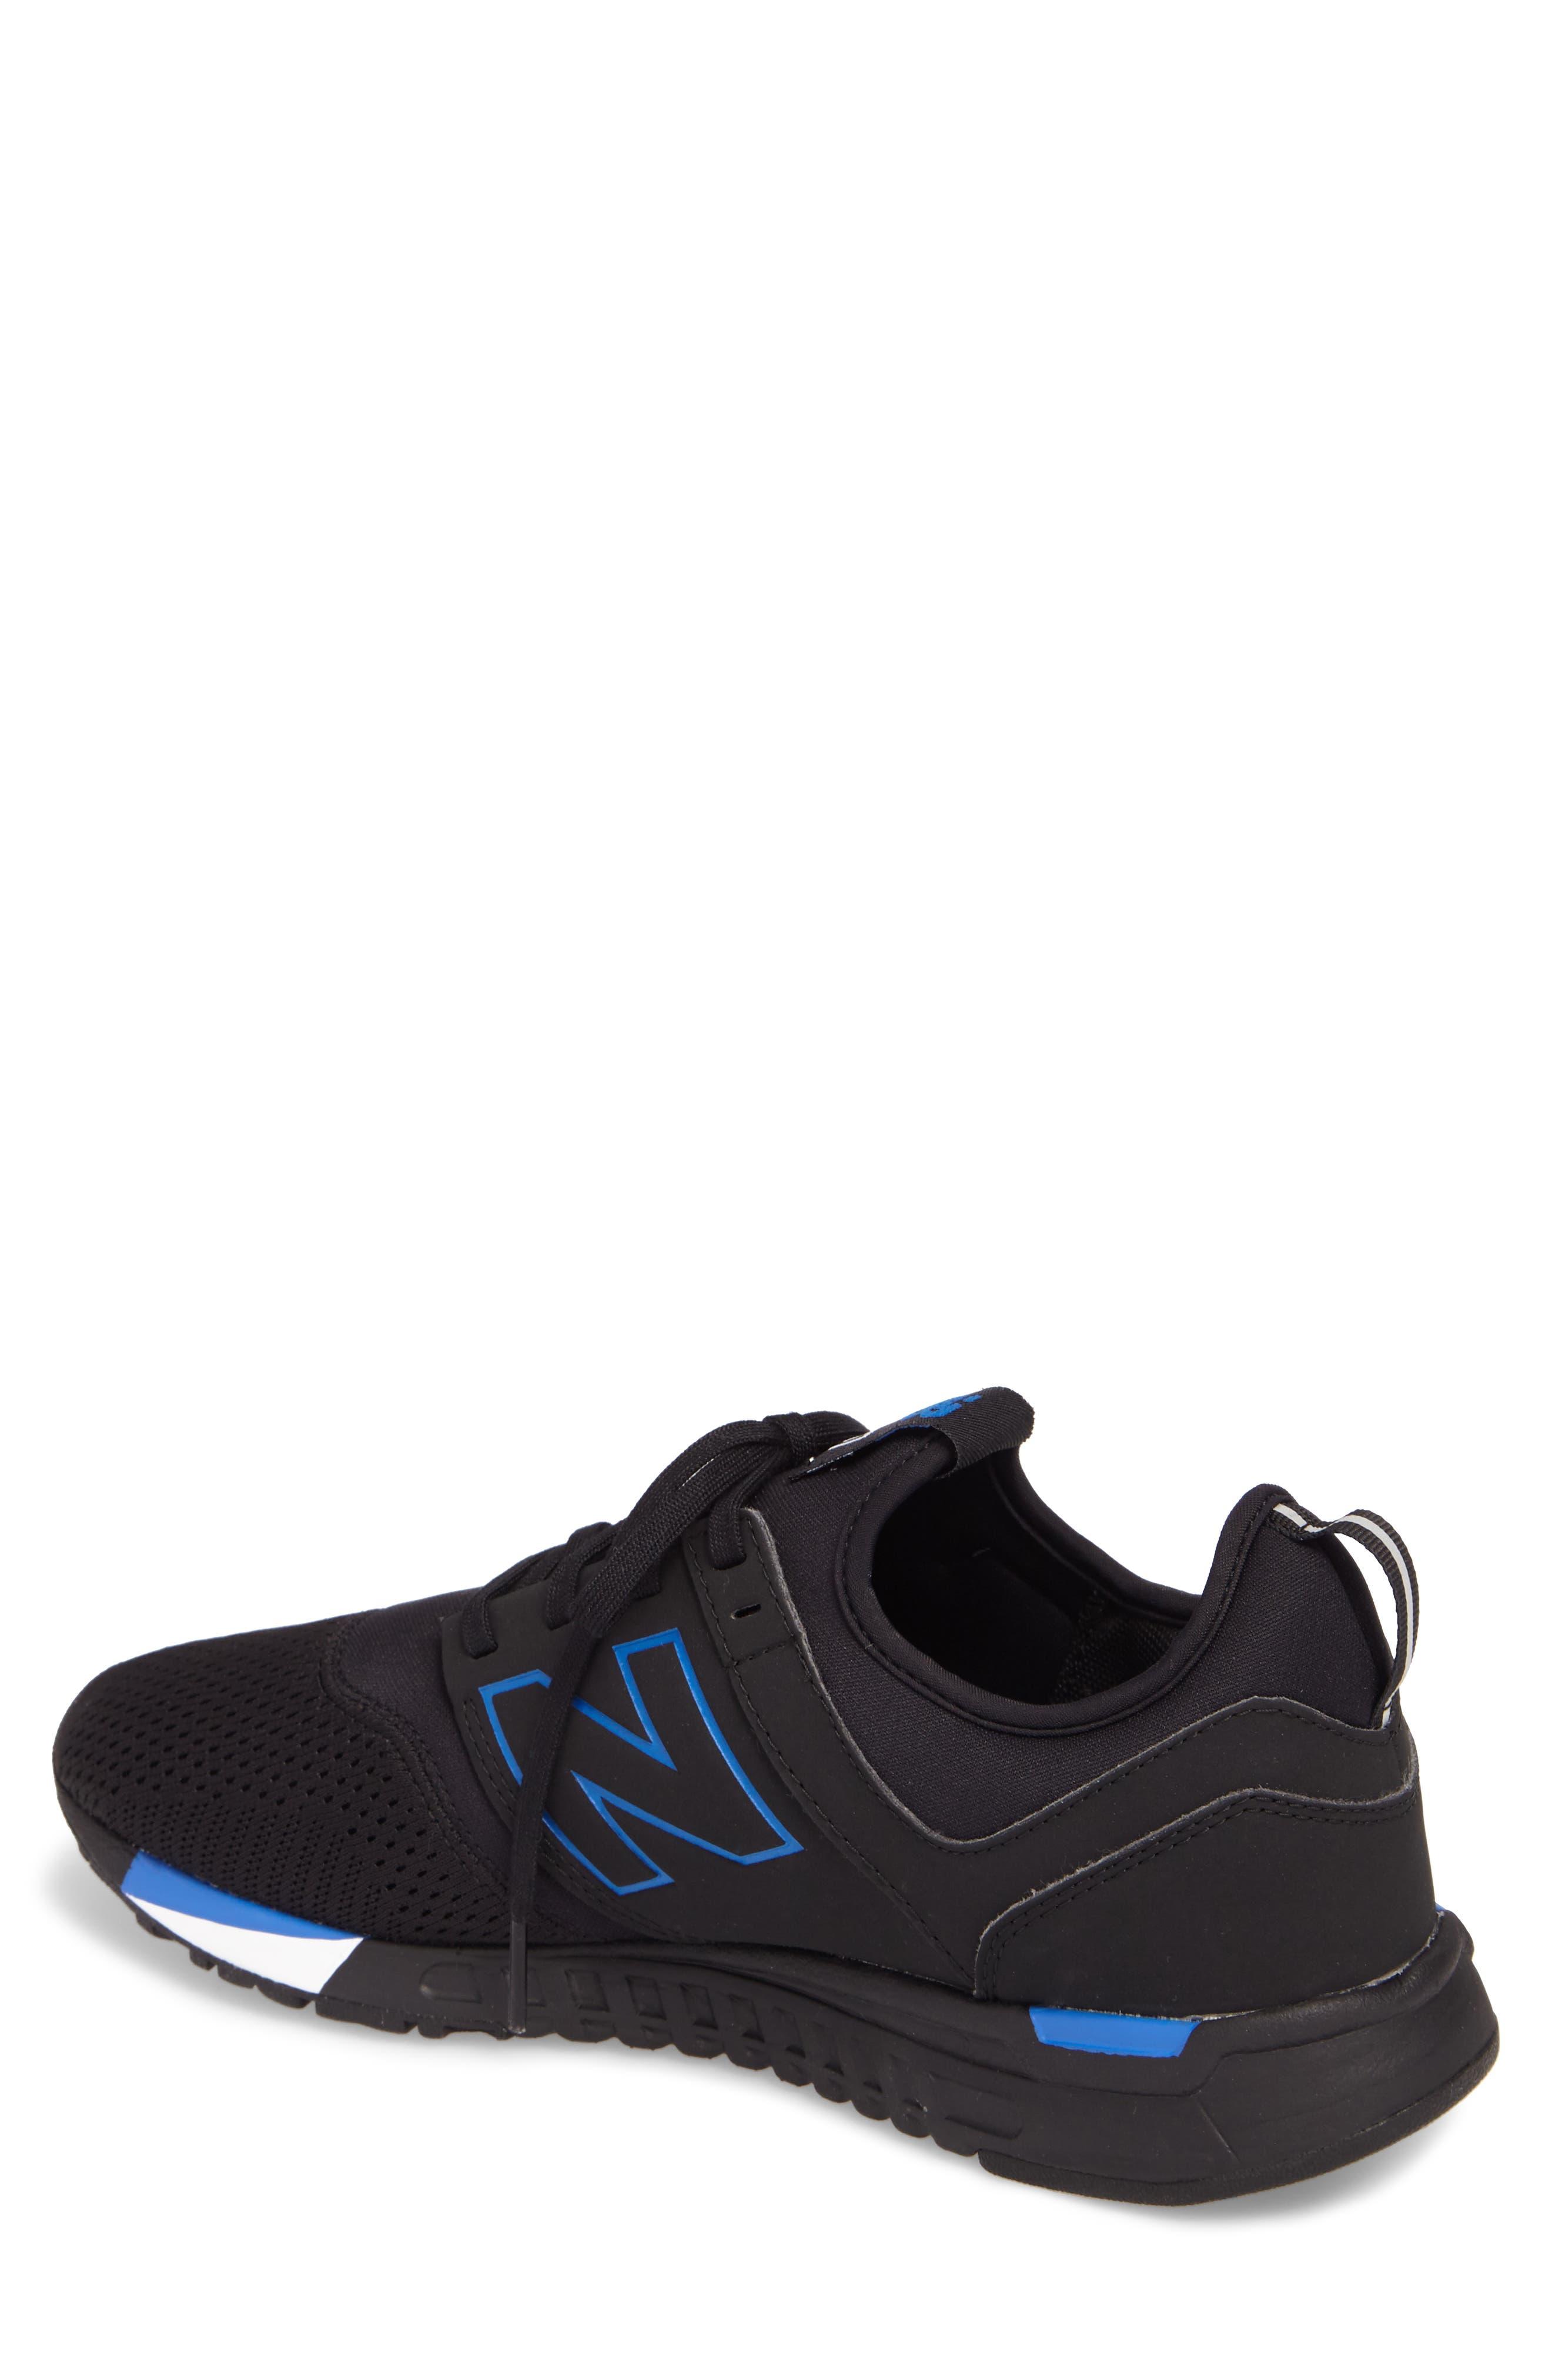 247 Sneaker,                             Alternate thumbnail 2, color,                             Black